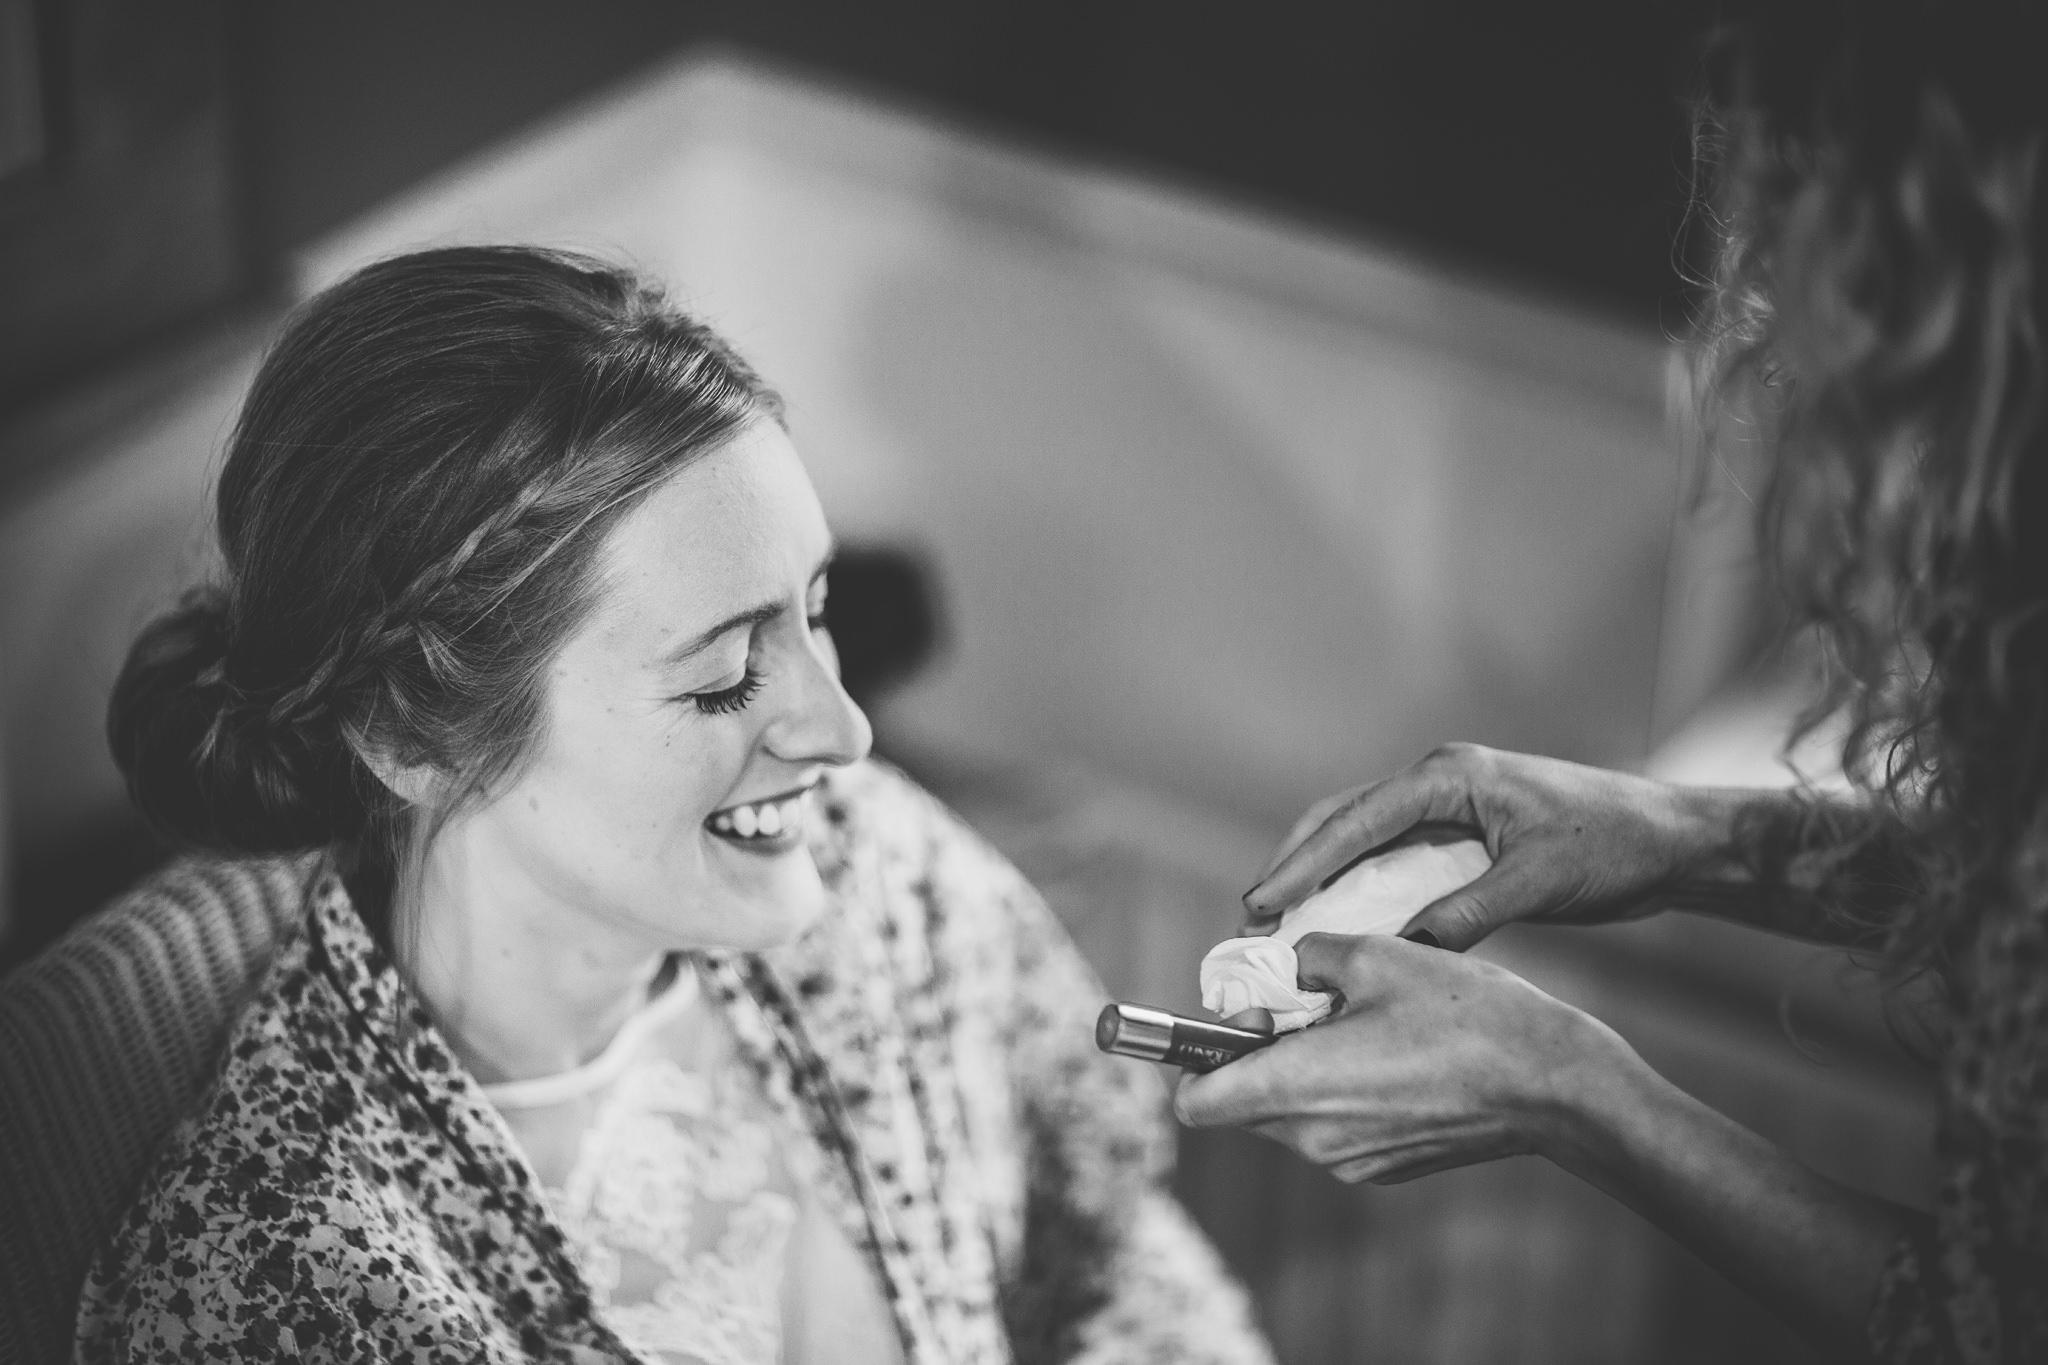 Creative-reportage-wedding-photography-90015